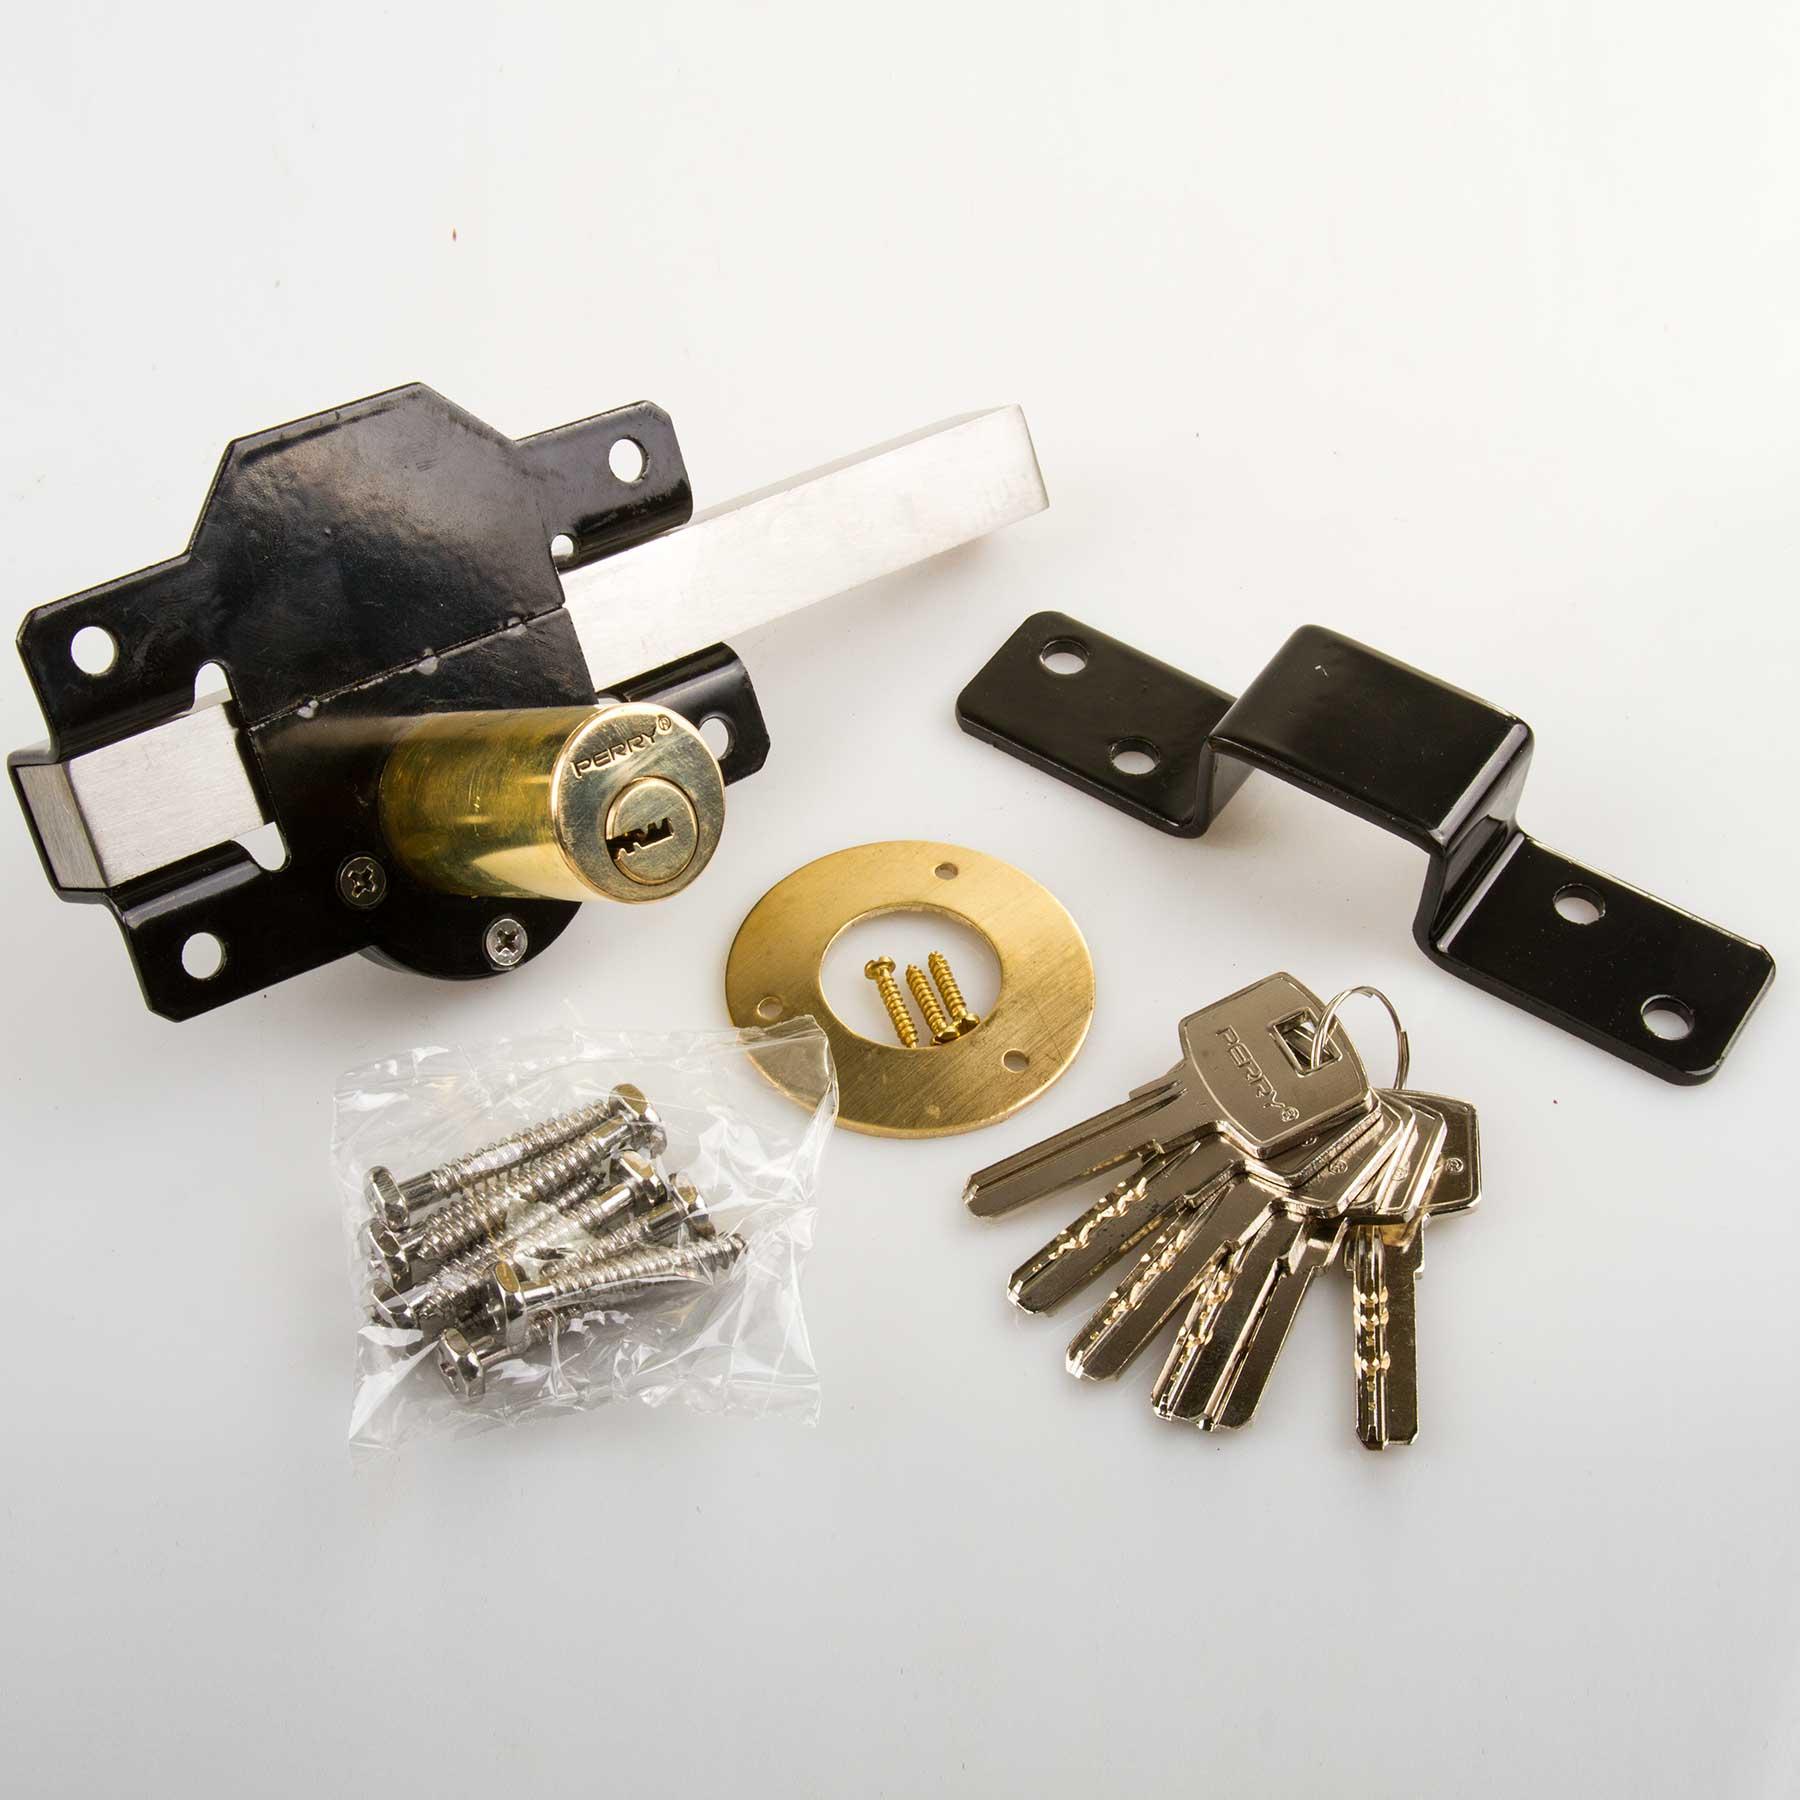 Garden Gate Keyed Alike 50mm Rim Lock For Door Driveway